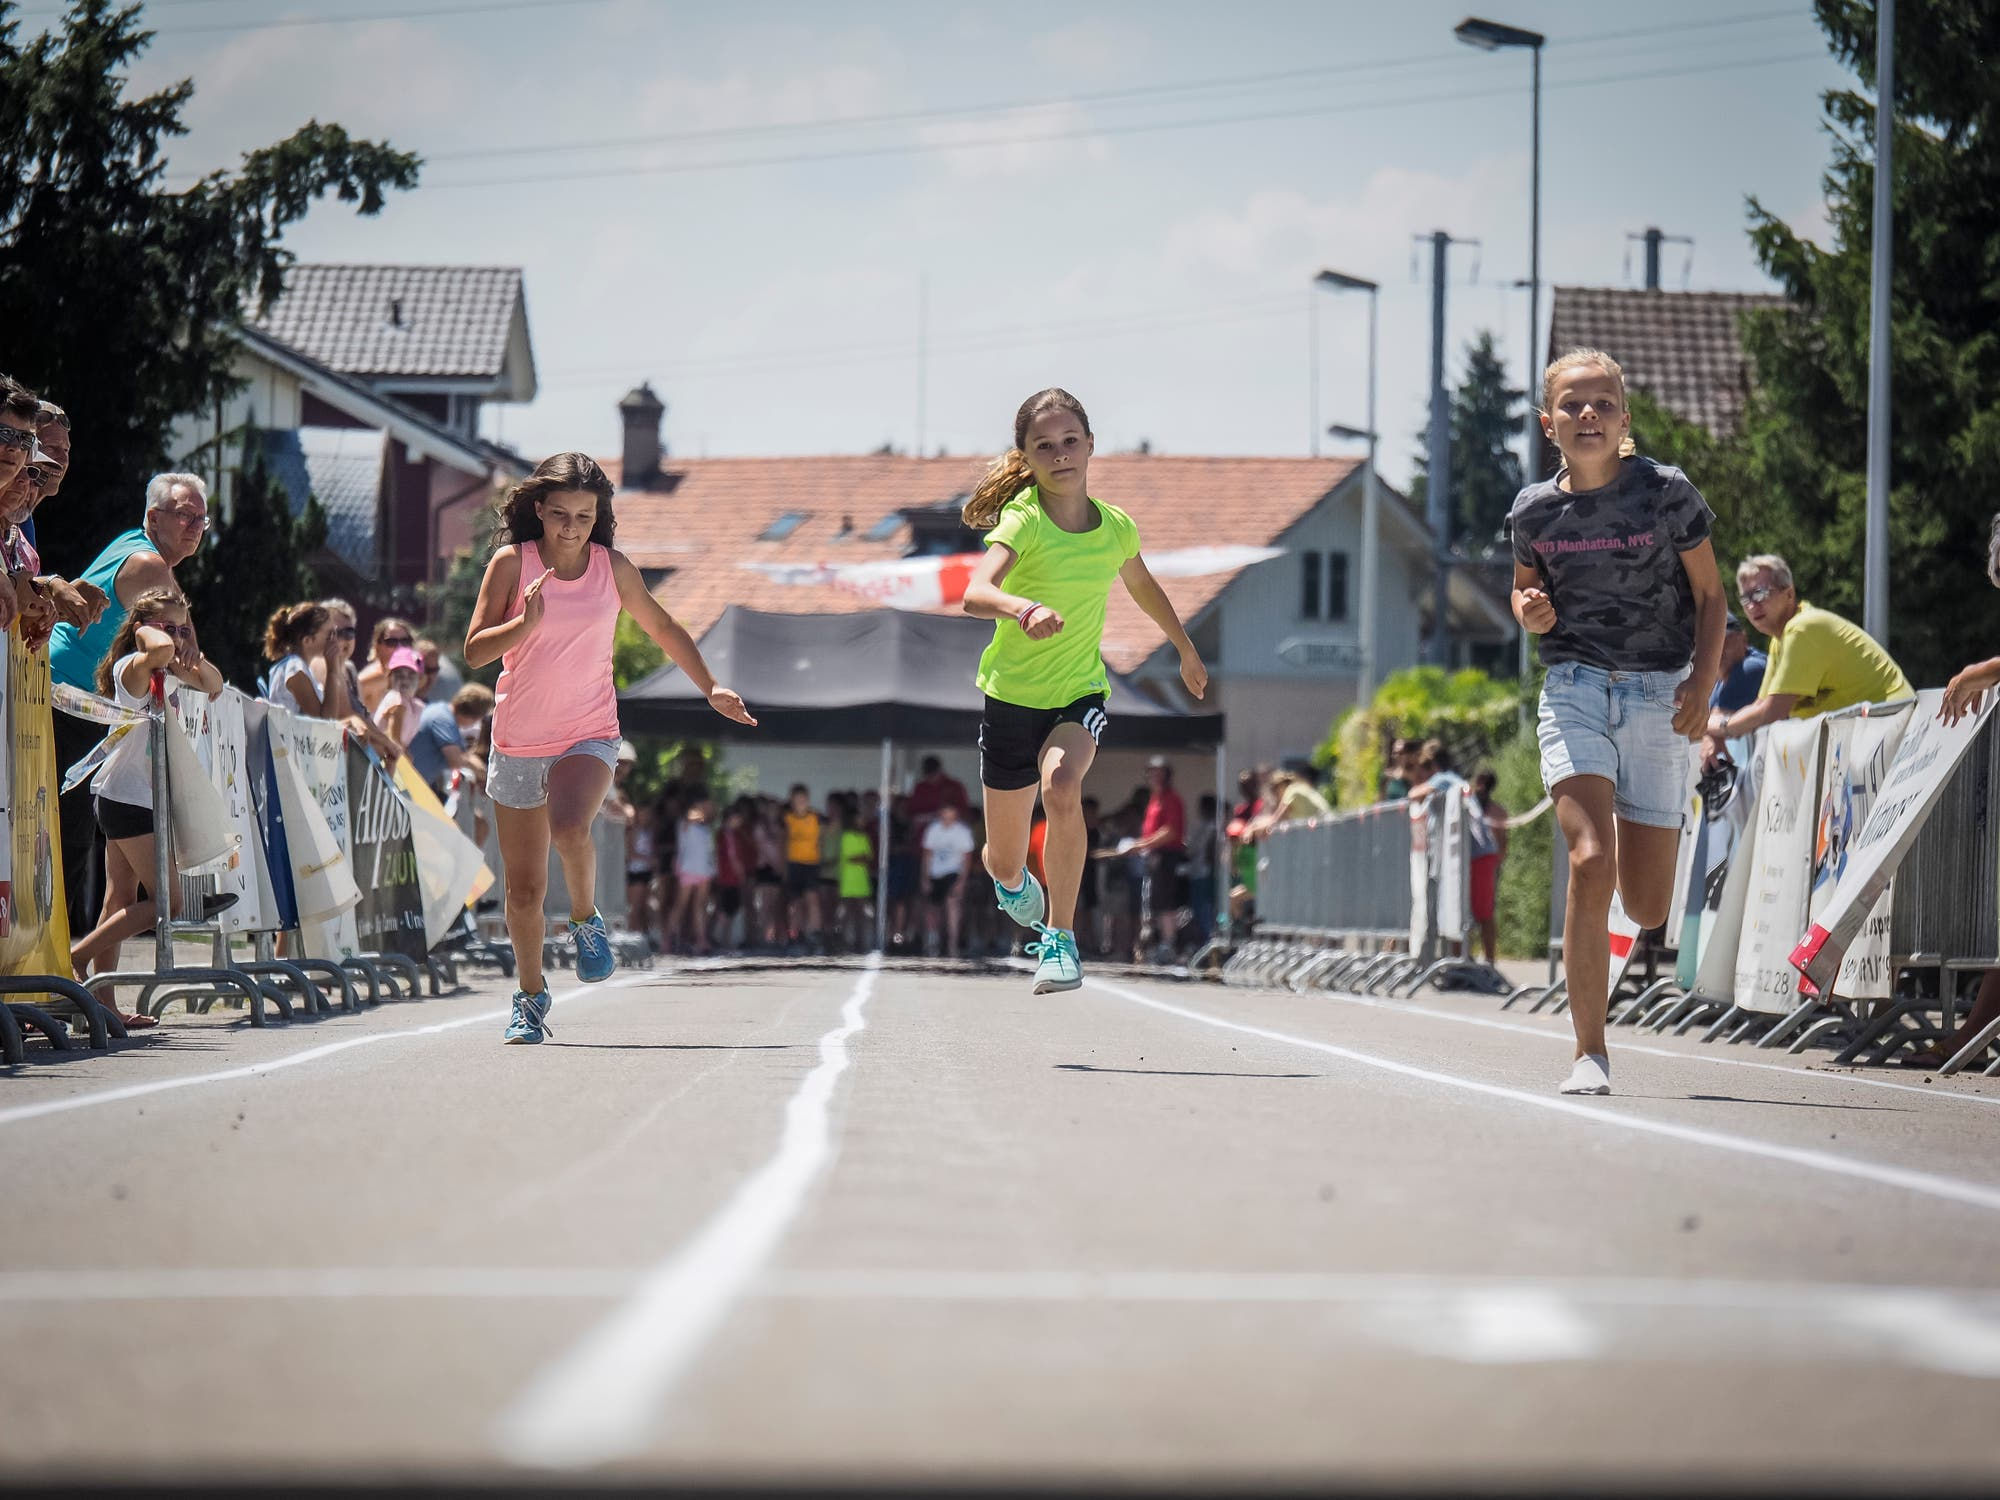 Nike sport Schuhe run in Baden Württemberg Bühl